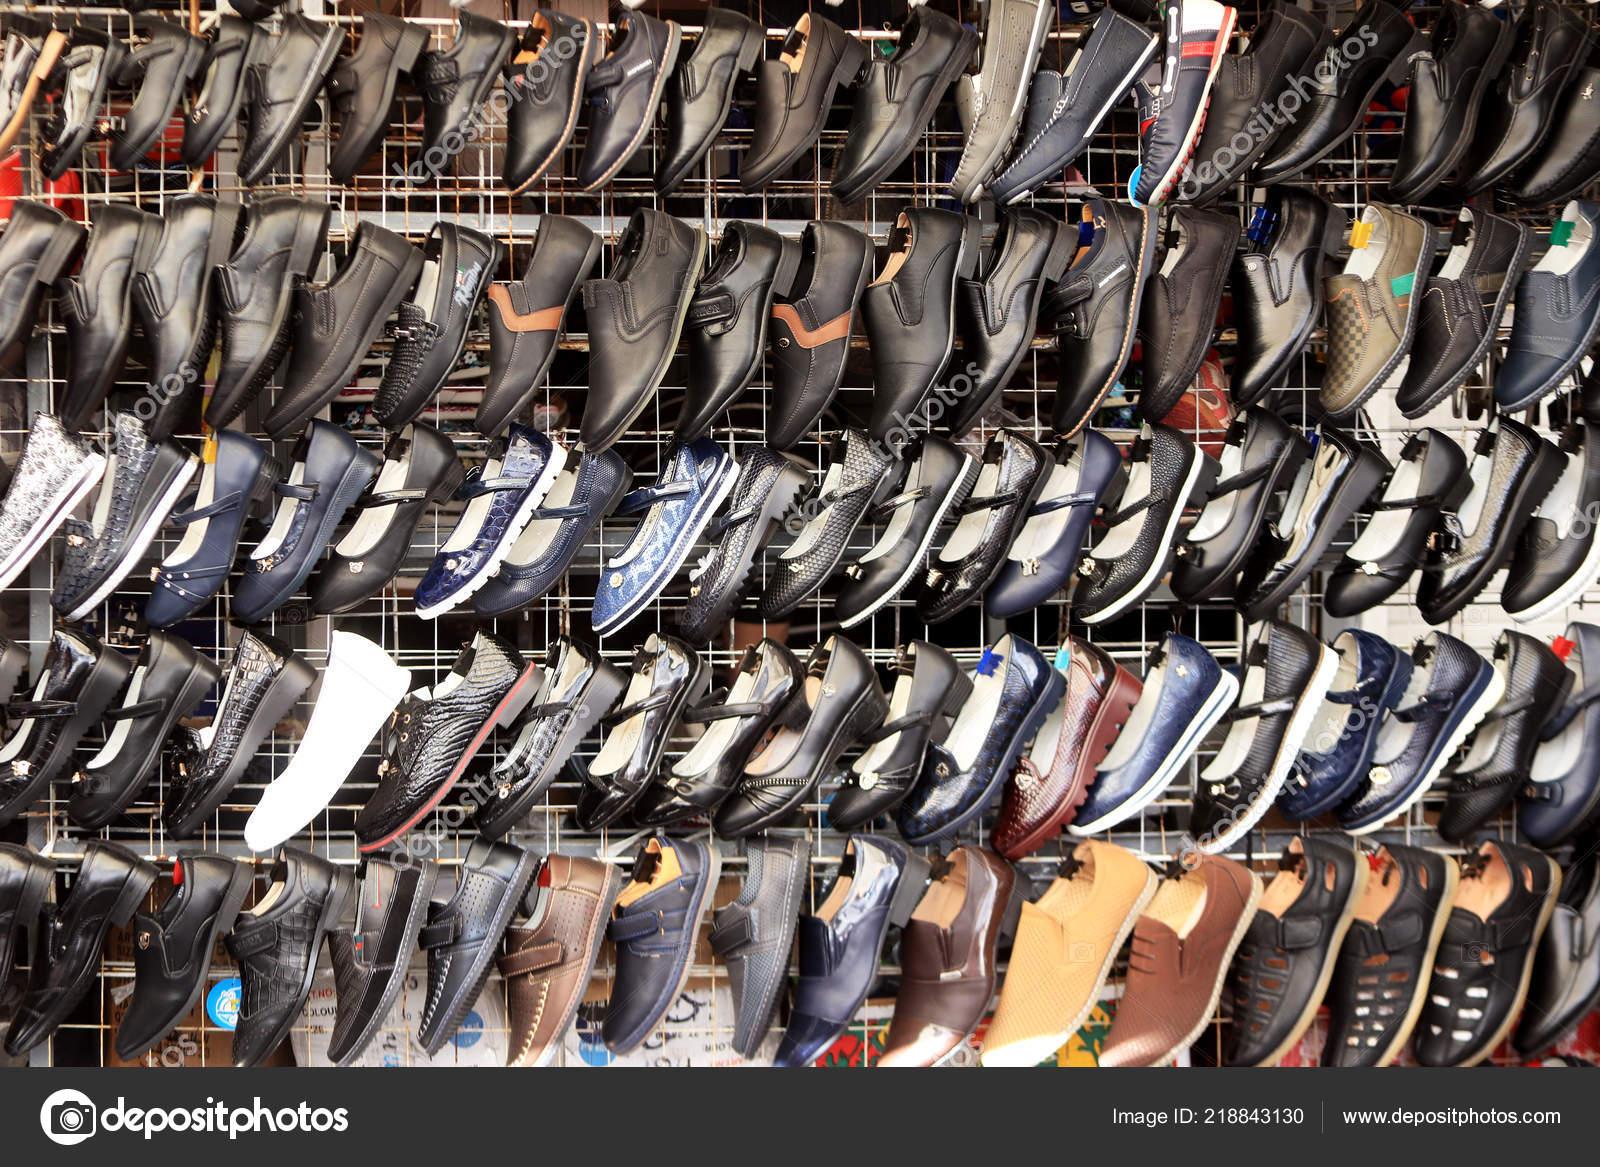 1316eddd542 Vitrine Chaussure Rack Beaucoup Chaussures Vendre Marché Rue — Photo ...